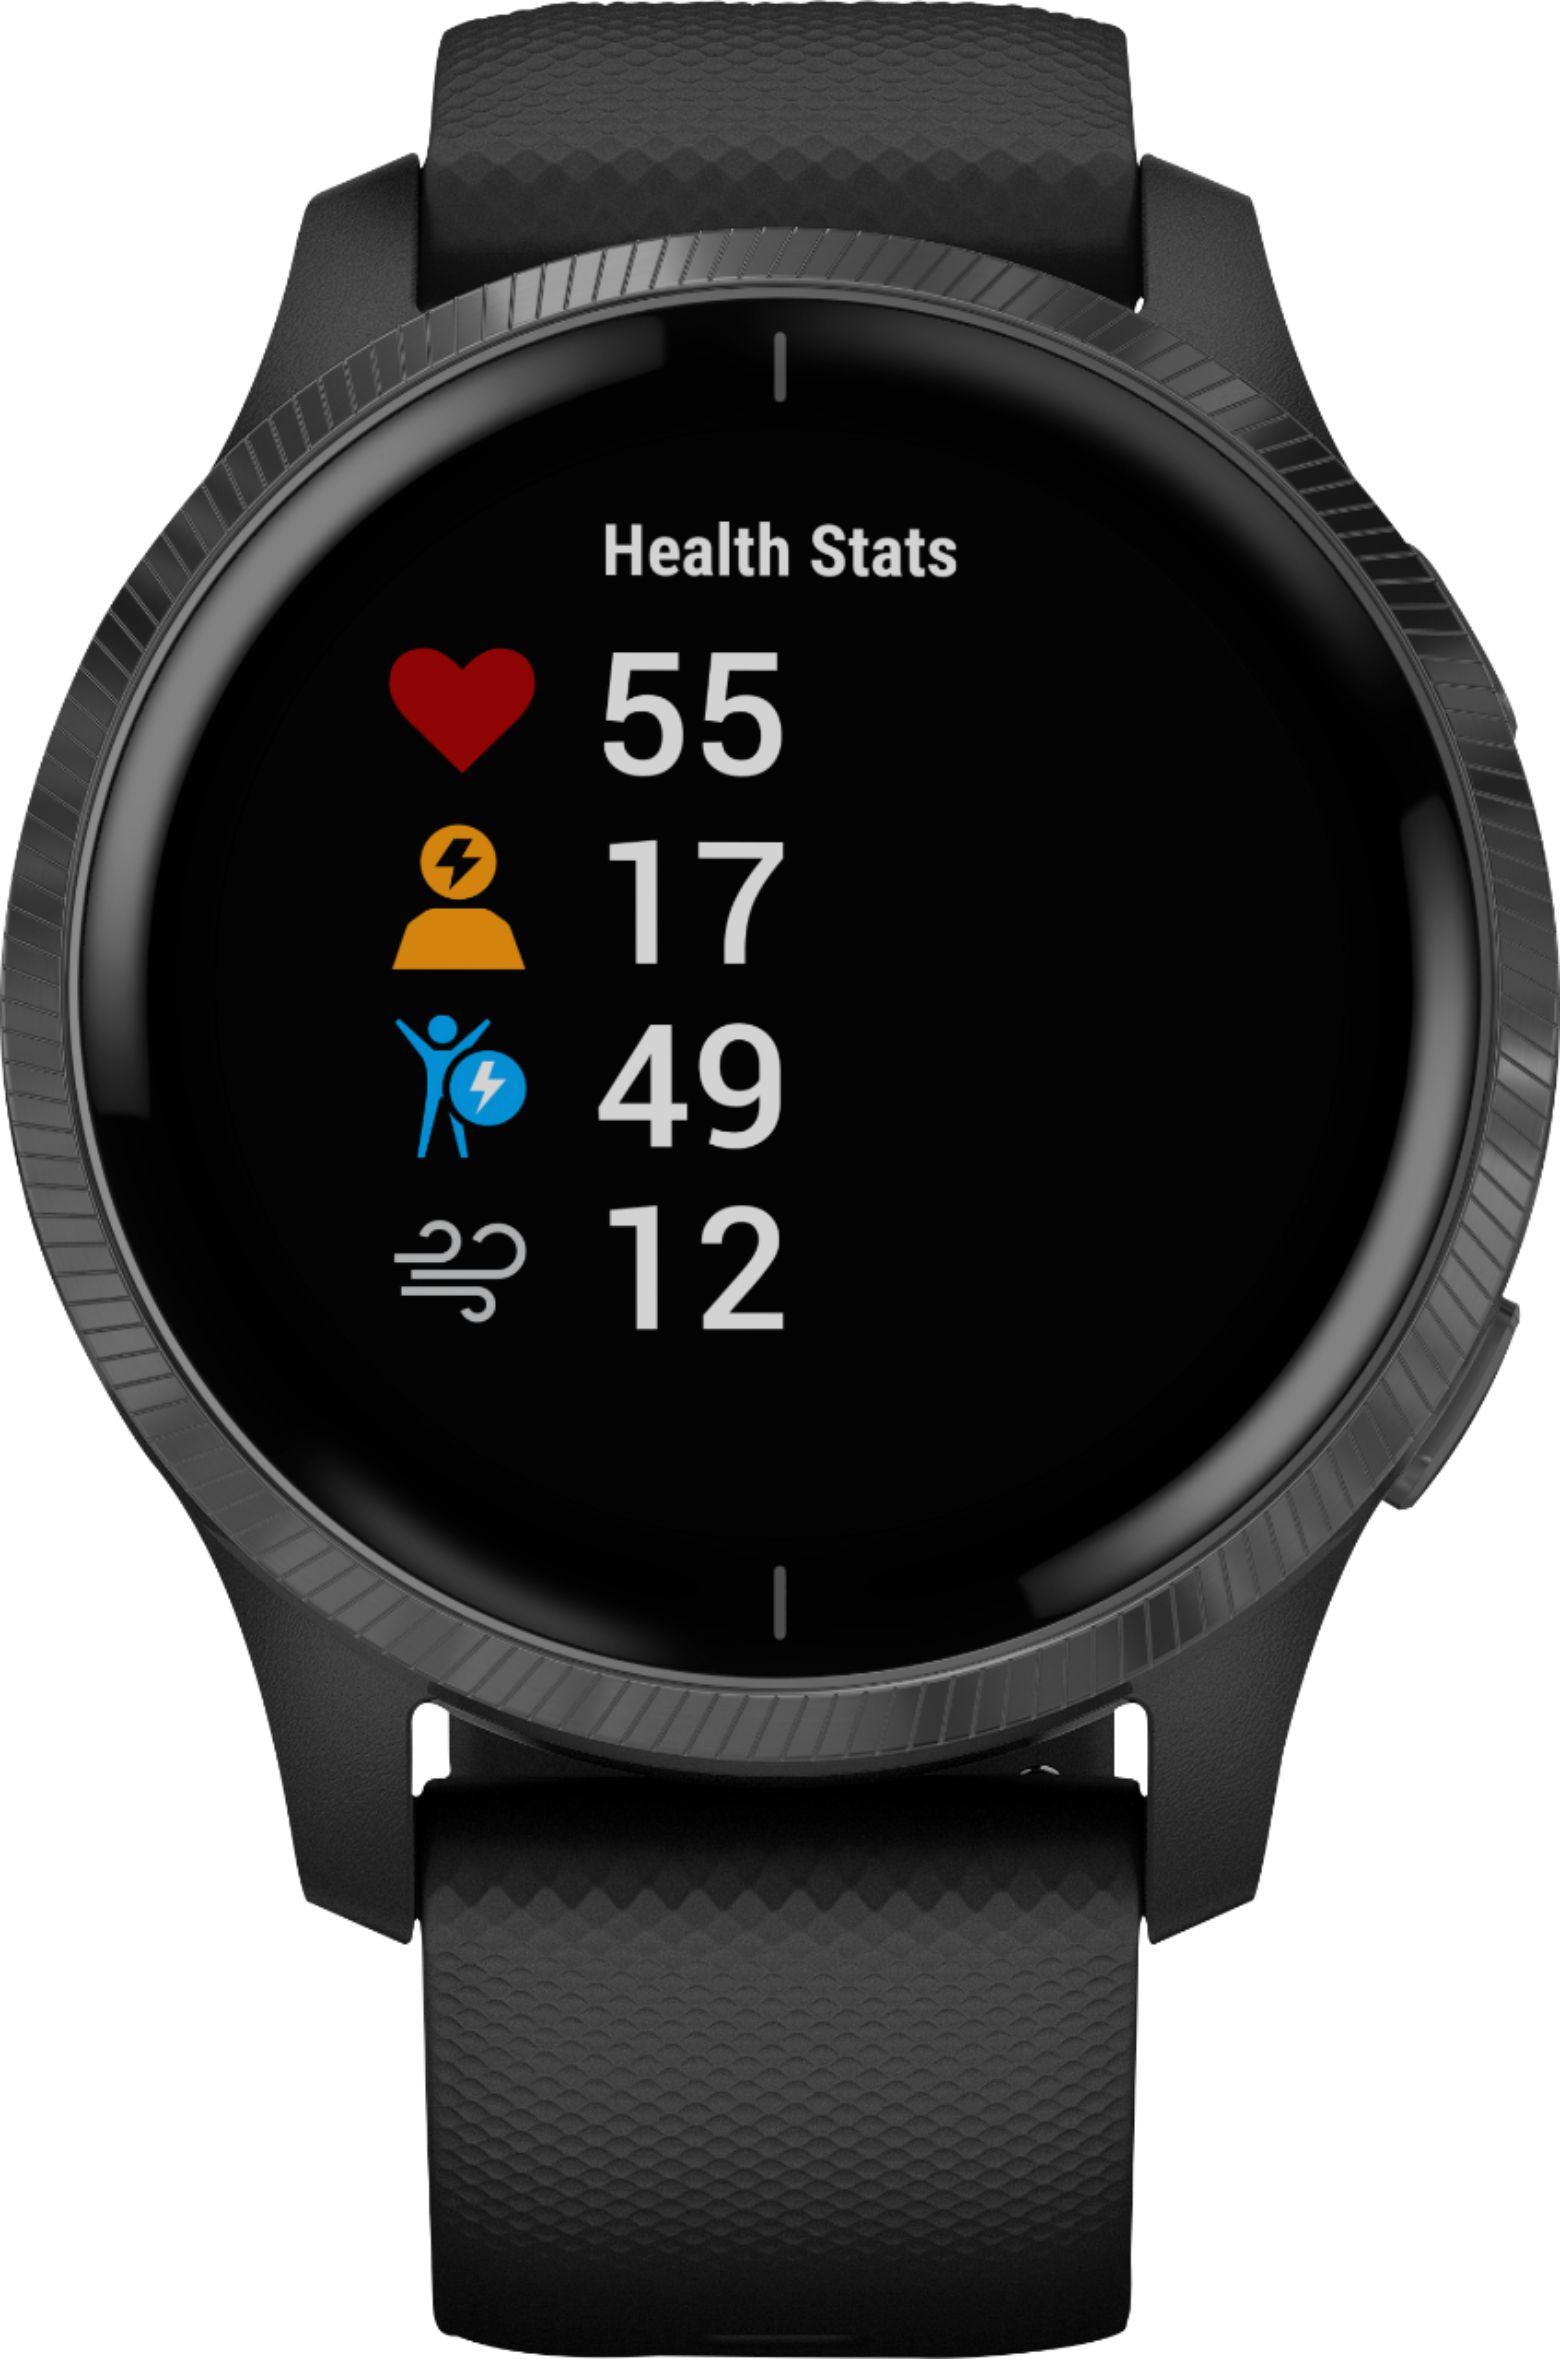 Garmin - Venu Smartwatch 43mm Fiber-Reinforced Polymer - Black With Silicone Band